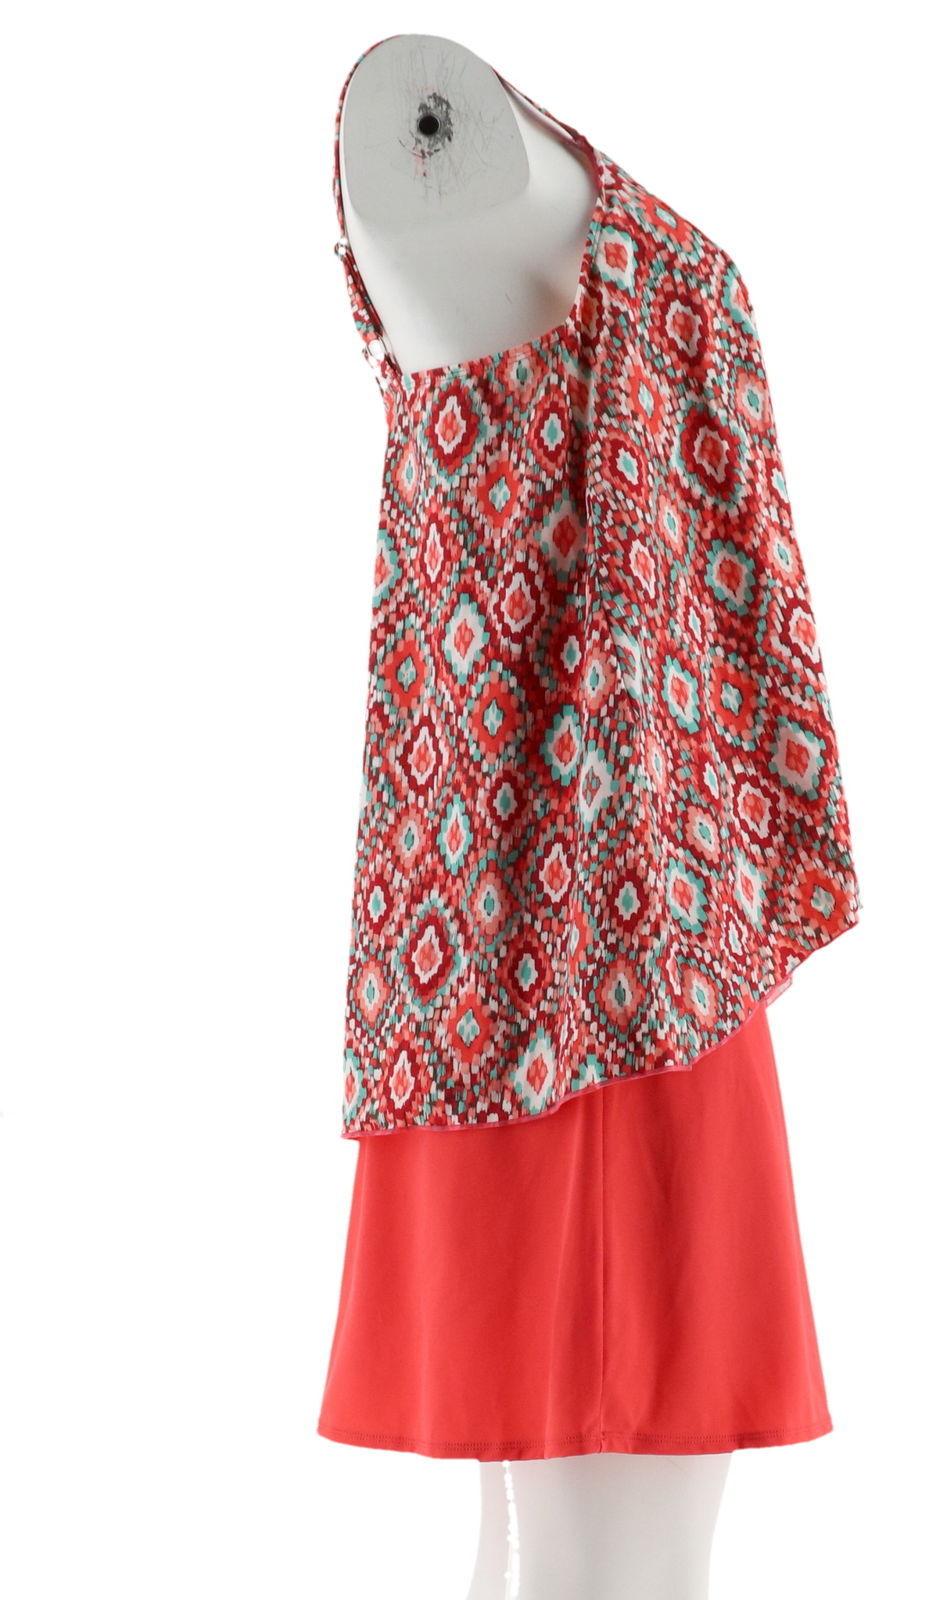 Denim& Co Beach Hi-Low Tankini Swimsuit Skirt Coral Ikat 16 NEW A303155